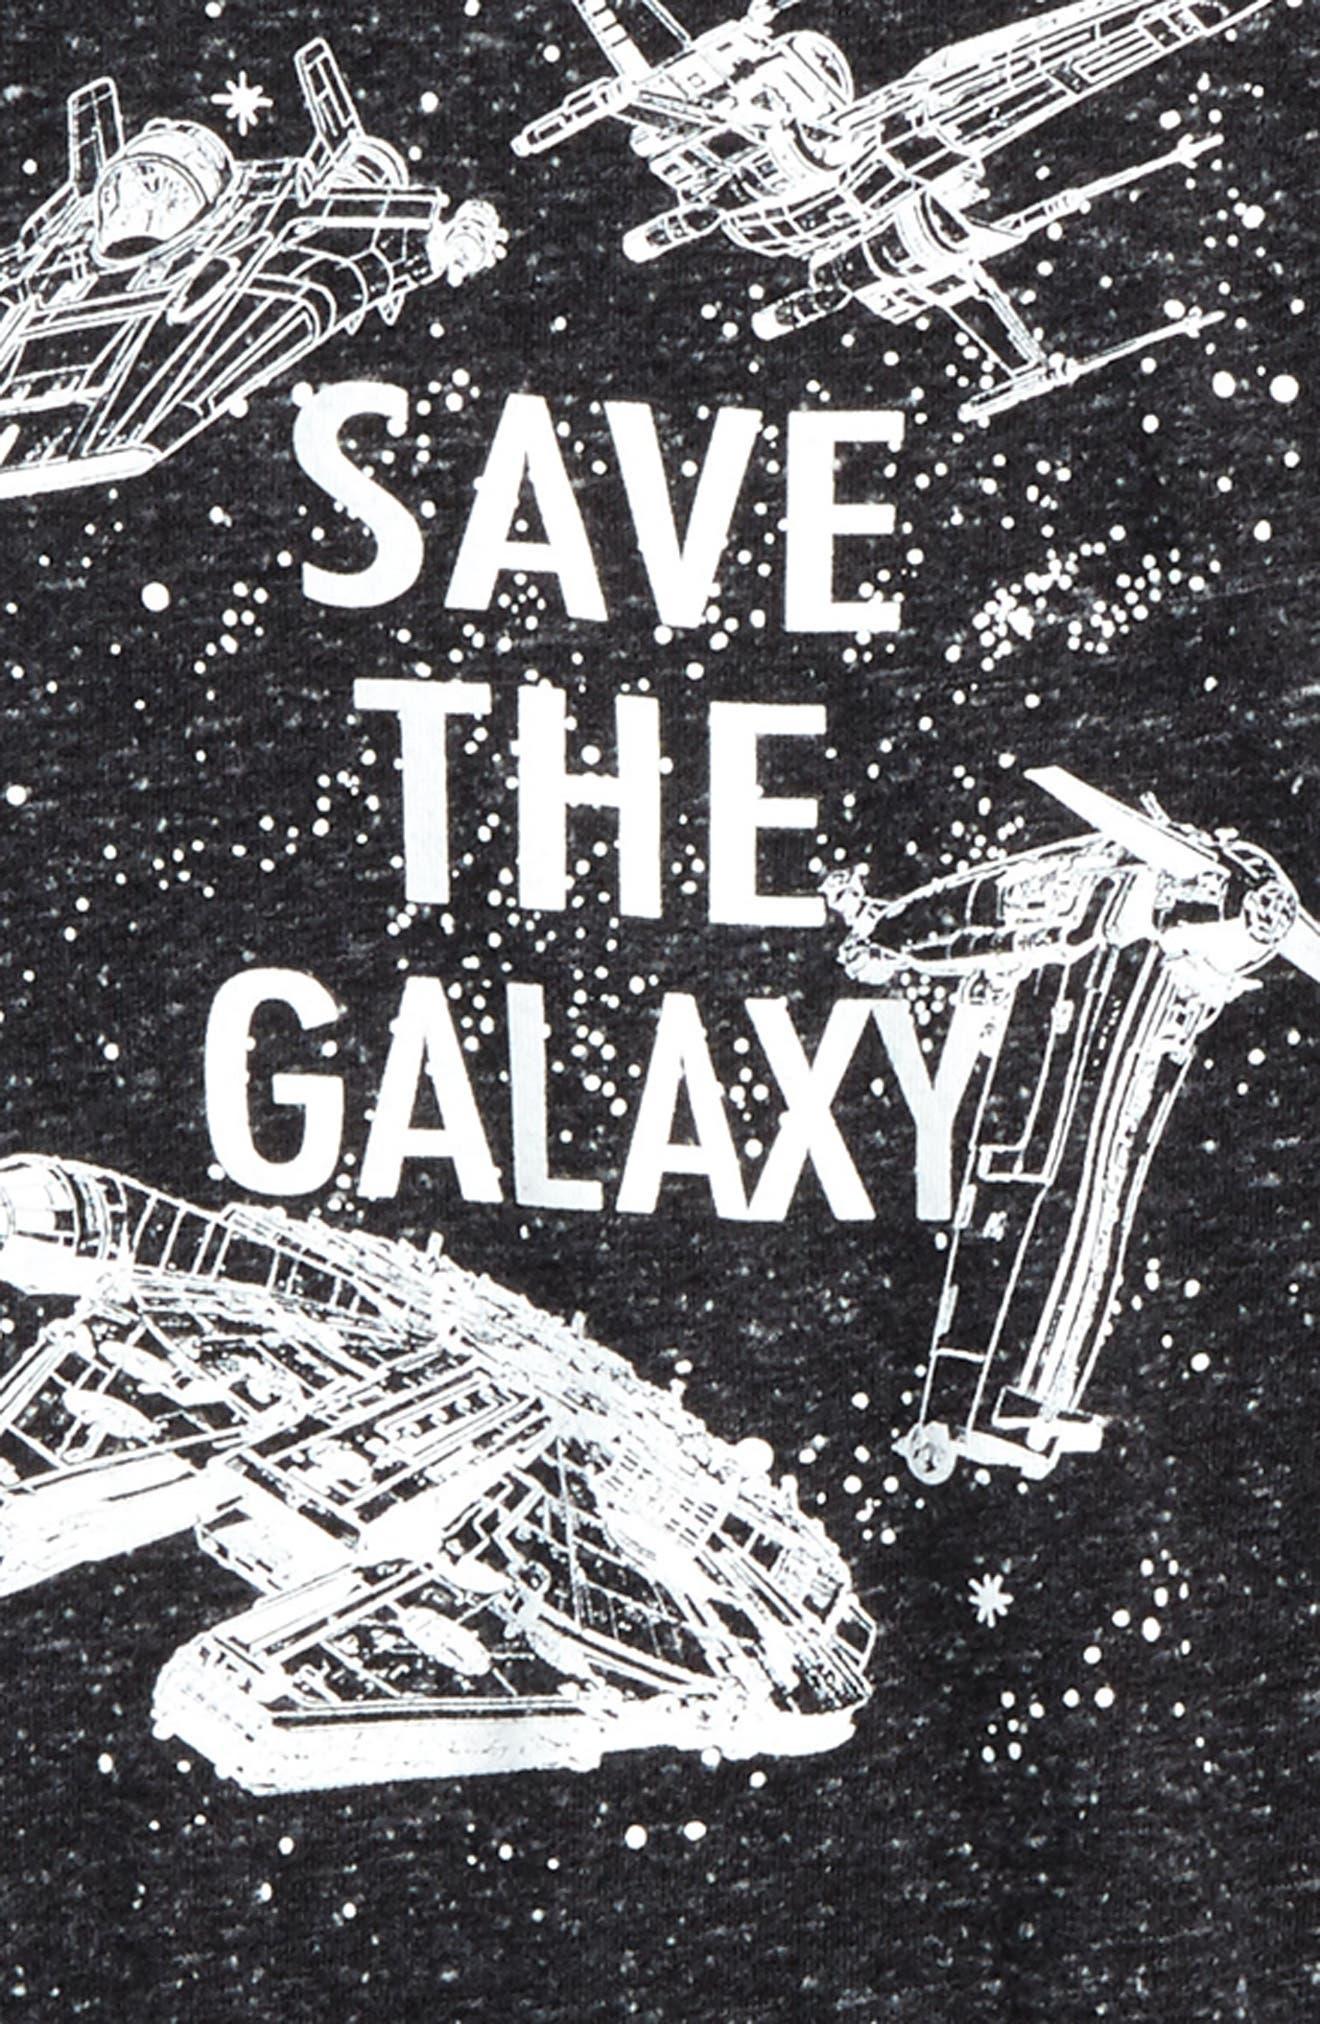 Alternate Image 2  - Jem Star Wars - Save the Galaxy Glow in the Dark T-Shirt (Big Boys)